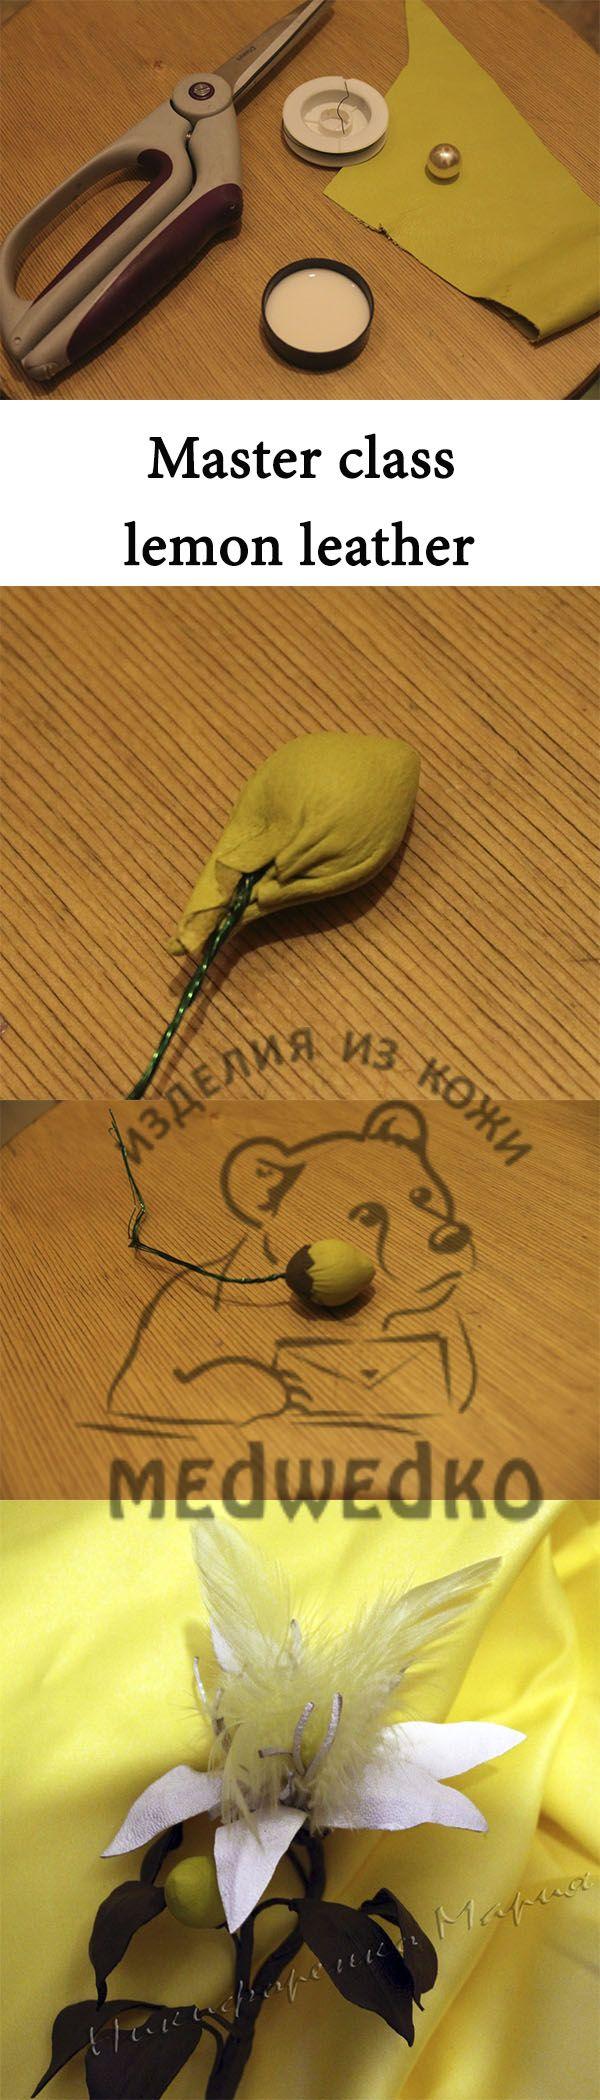 Мастер-класс Лимон из натуральной кожи. Легко сделать самим. #мастер_класс #лимон #лимон_из_кожи #мастер_класс_кожа #master_class #lemon_leather #master_class_leather